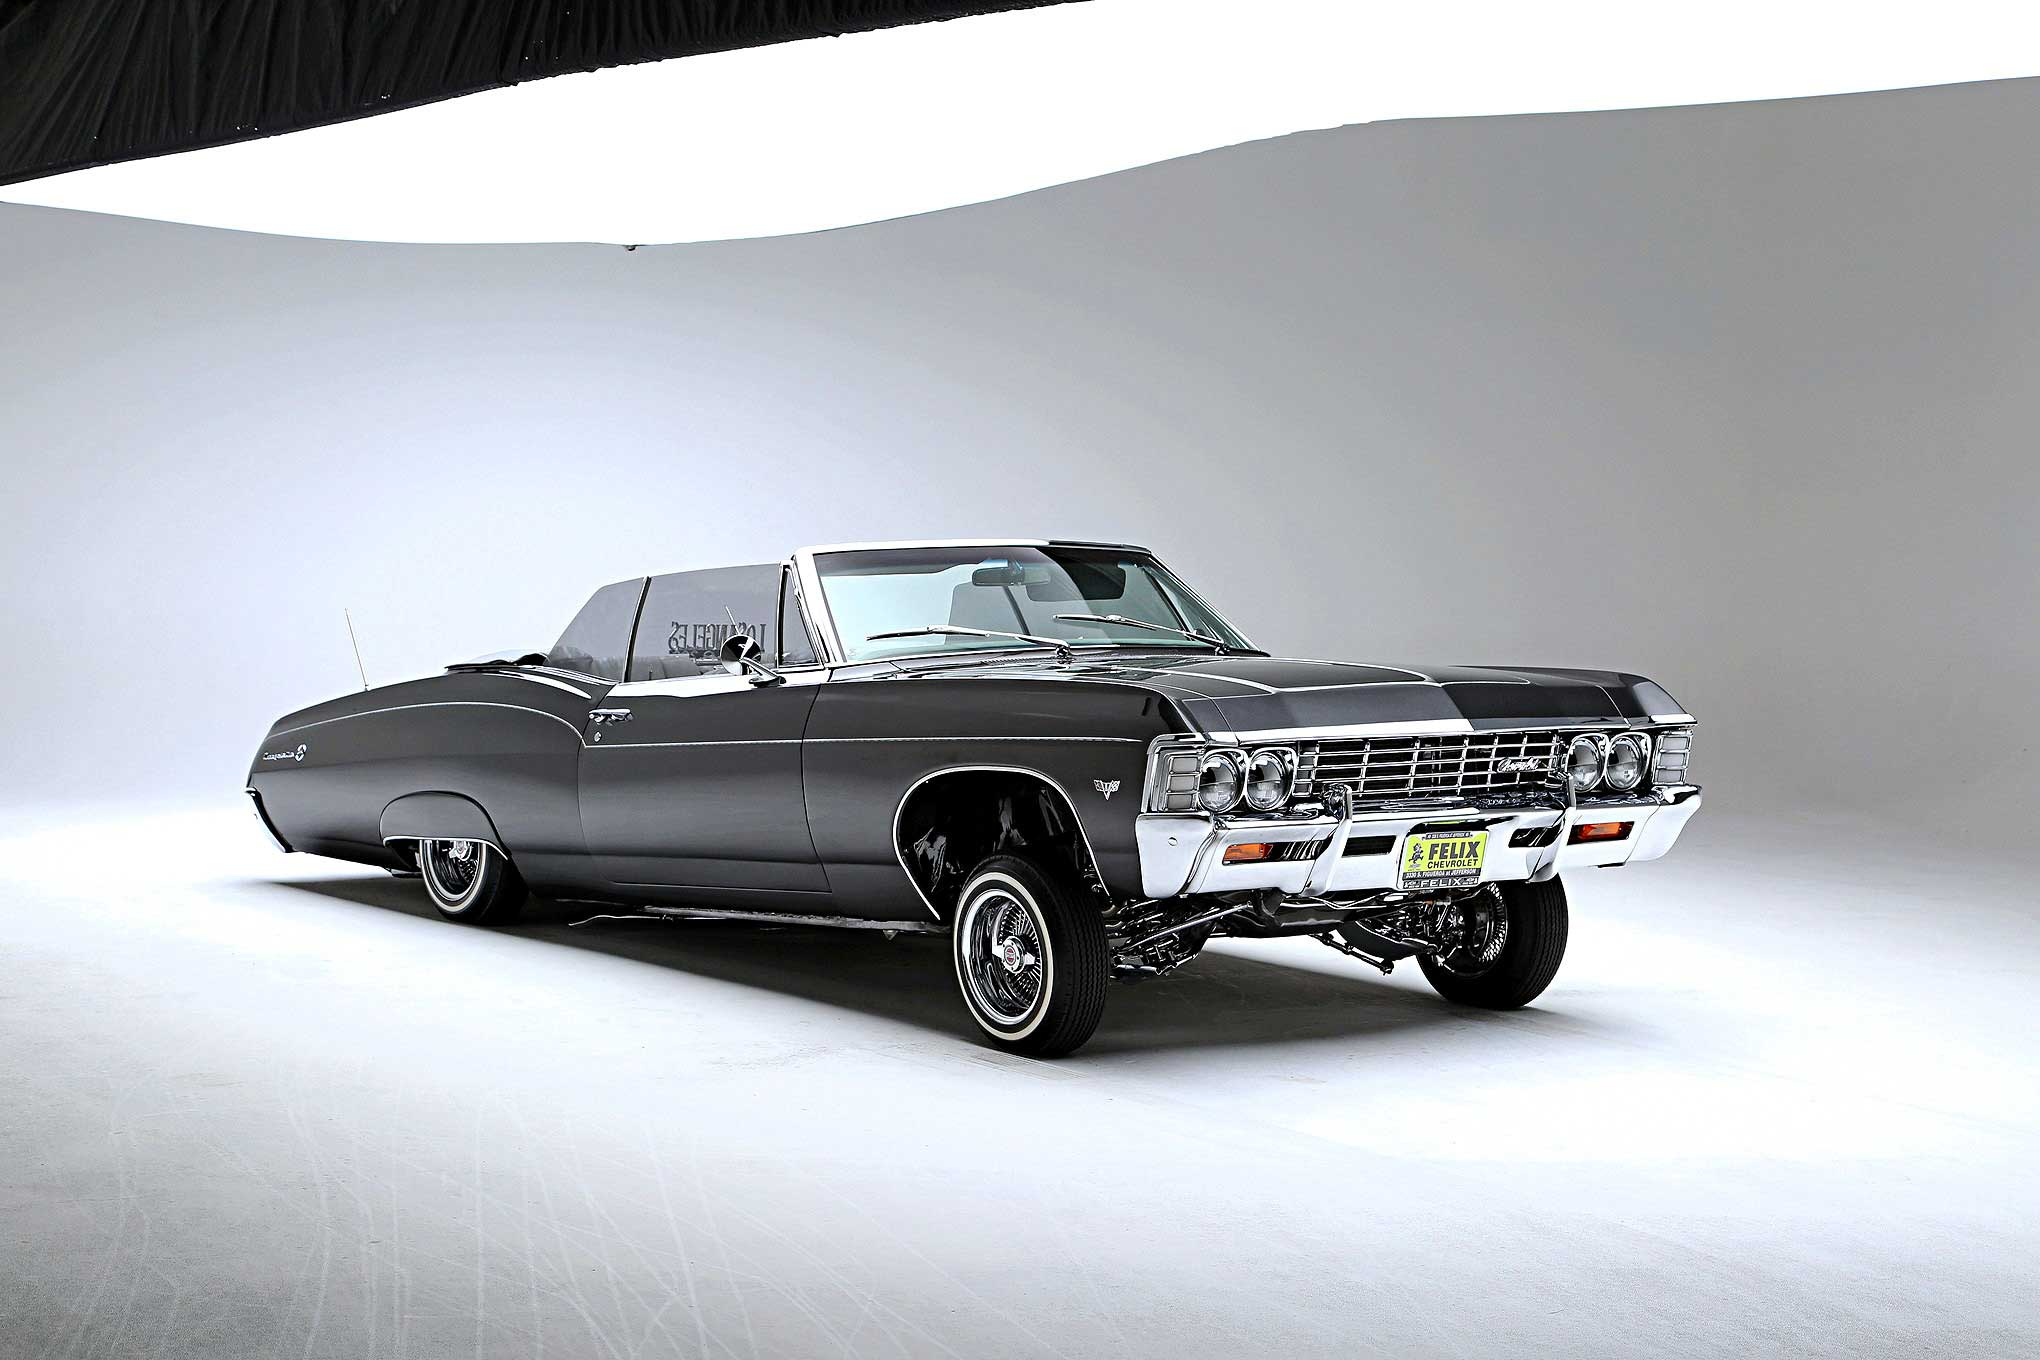 1967 Chevrolet Impala Convertible A Poor Man S Dream